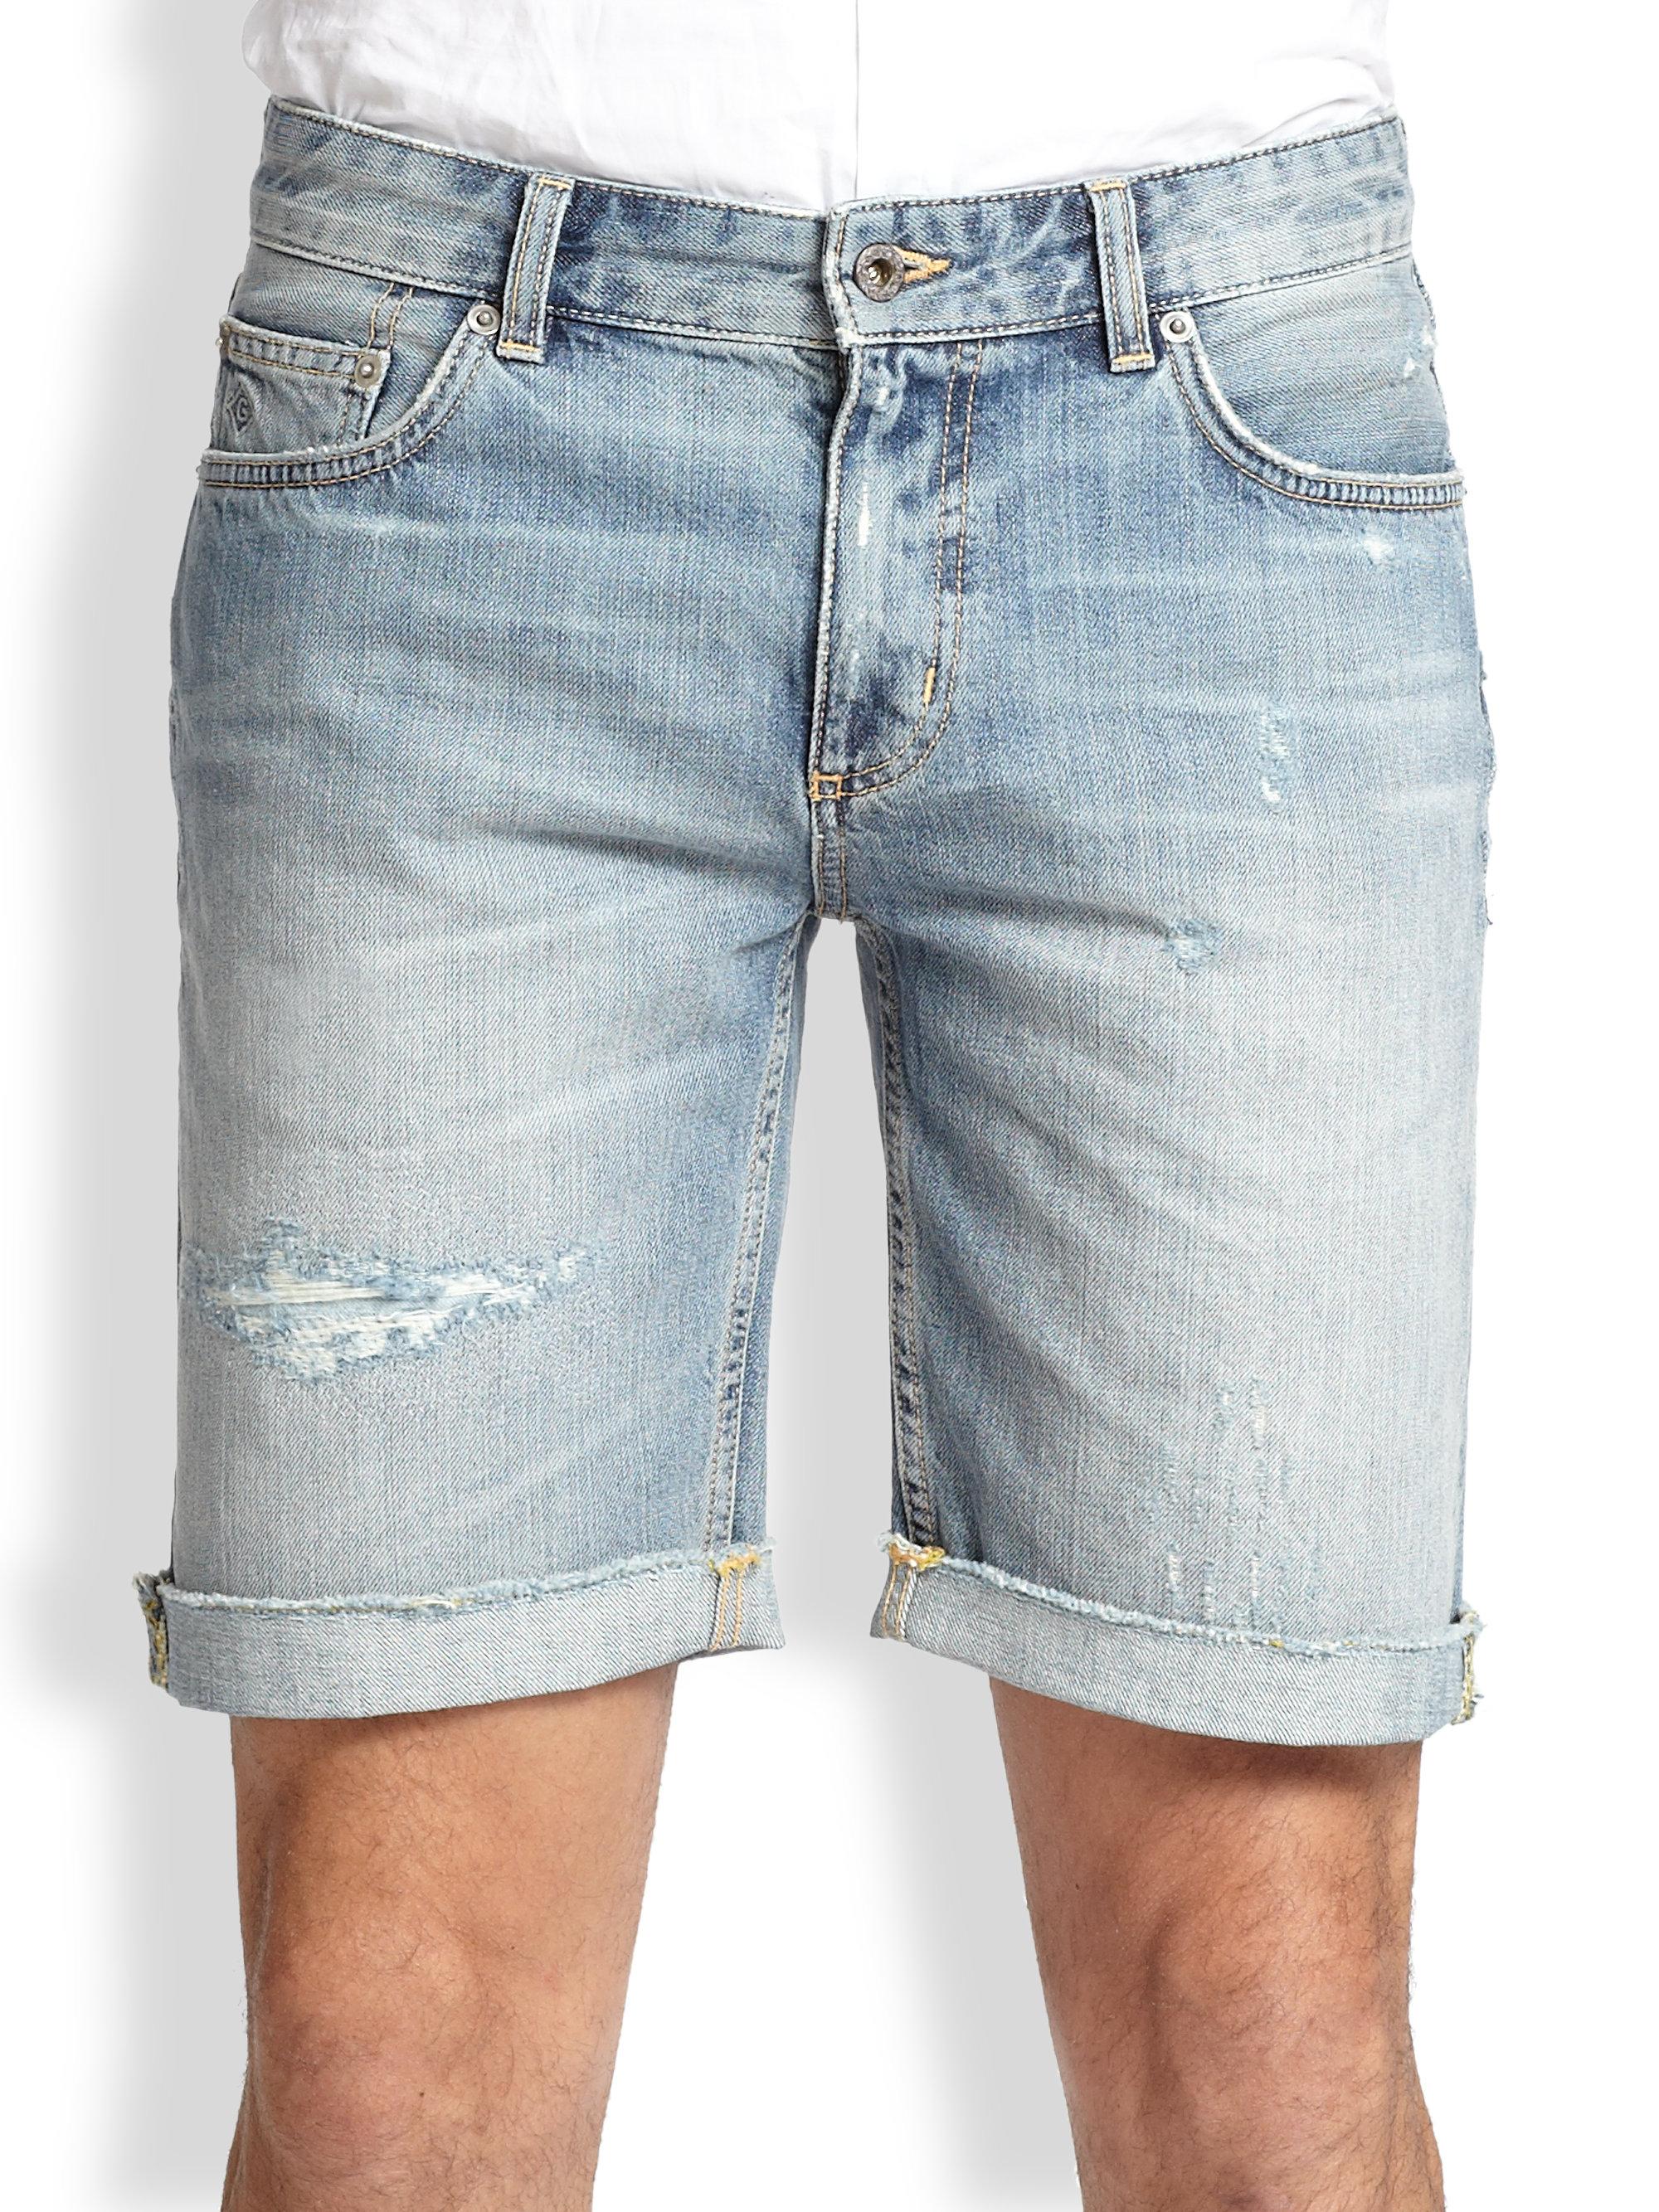 Outlet Low Shipping Fee Denim bermuda shorts GANT denim GANT Official Site Uj4ptM053